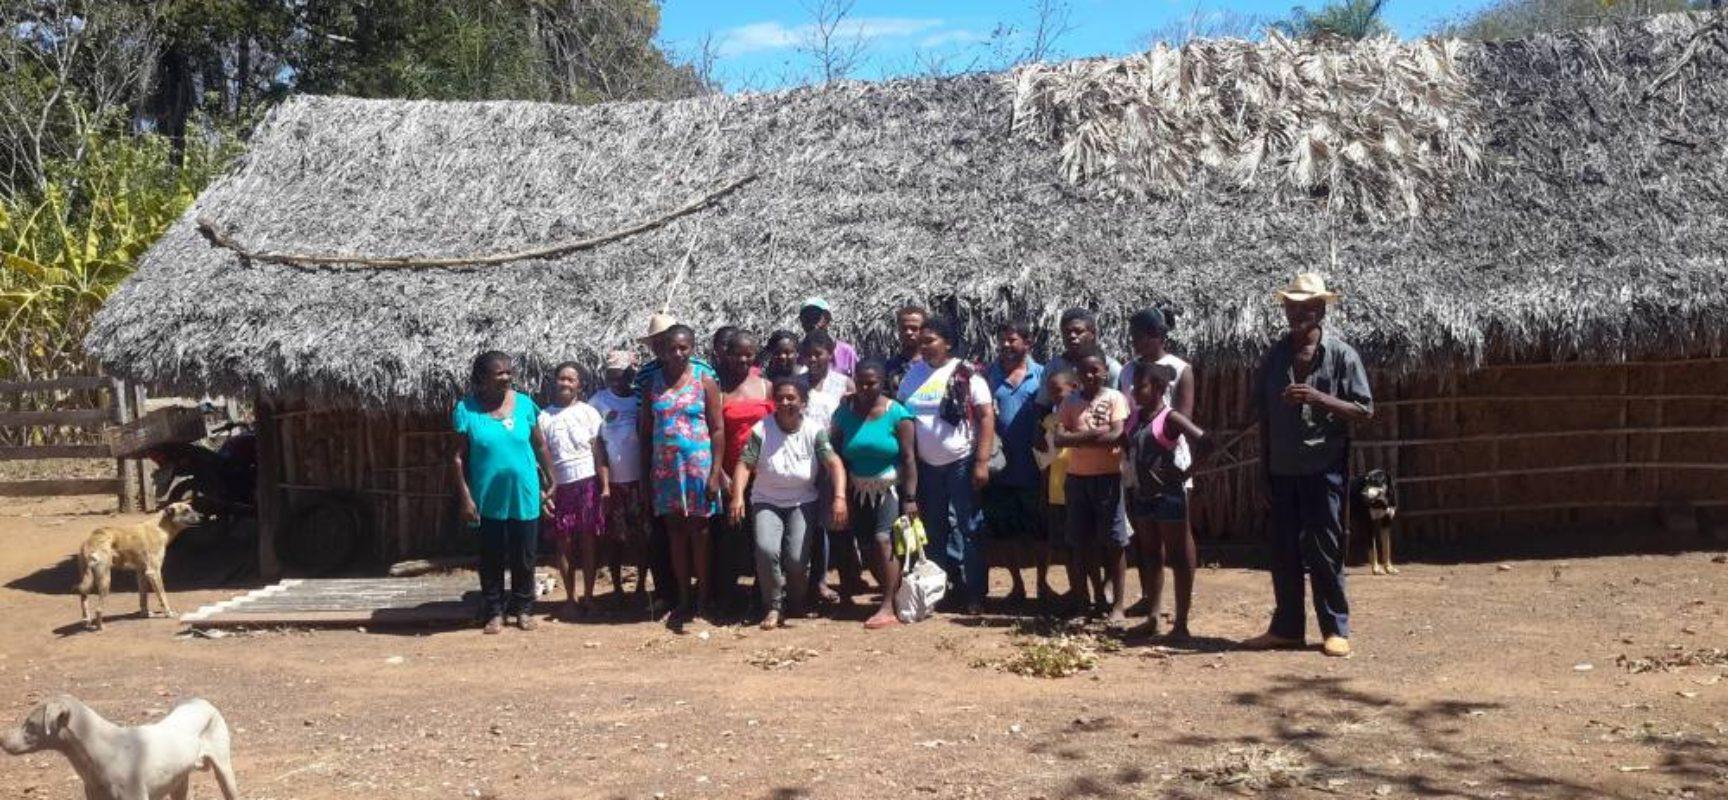 Governo investirá R$ 1,4 bi para combater covid-19 em quilombos